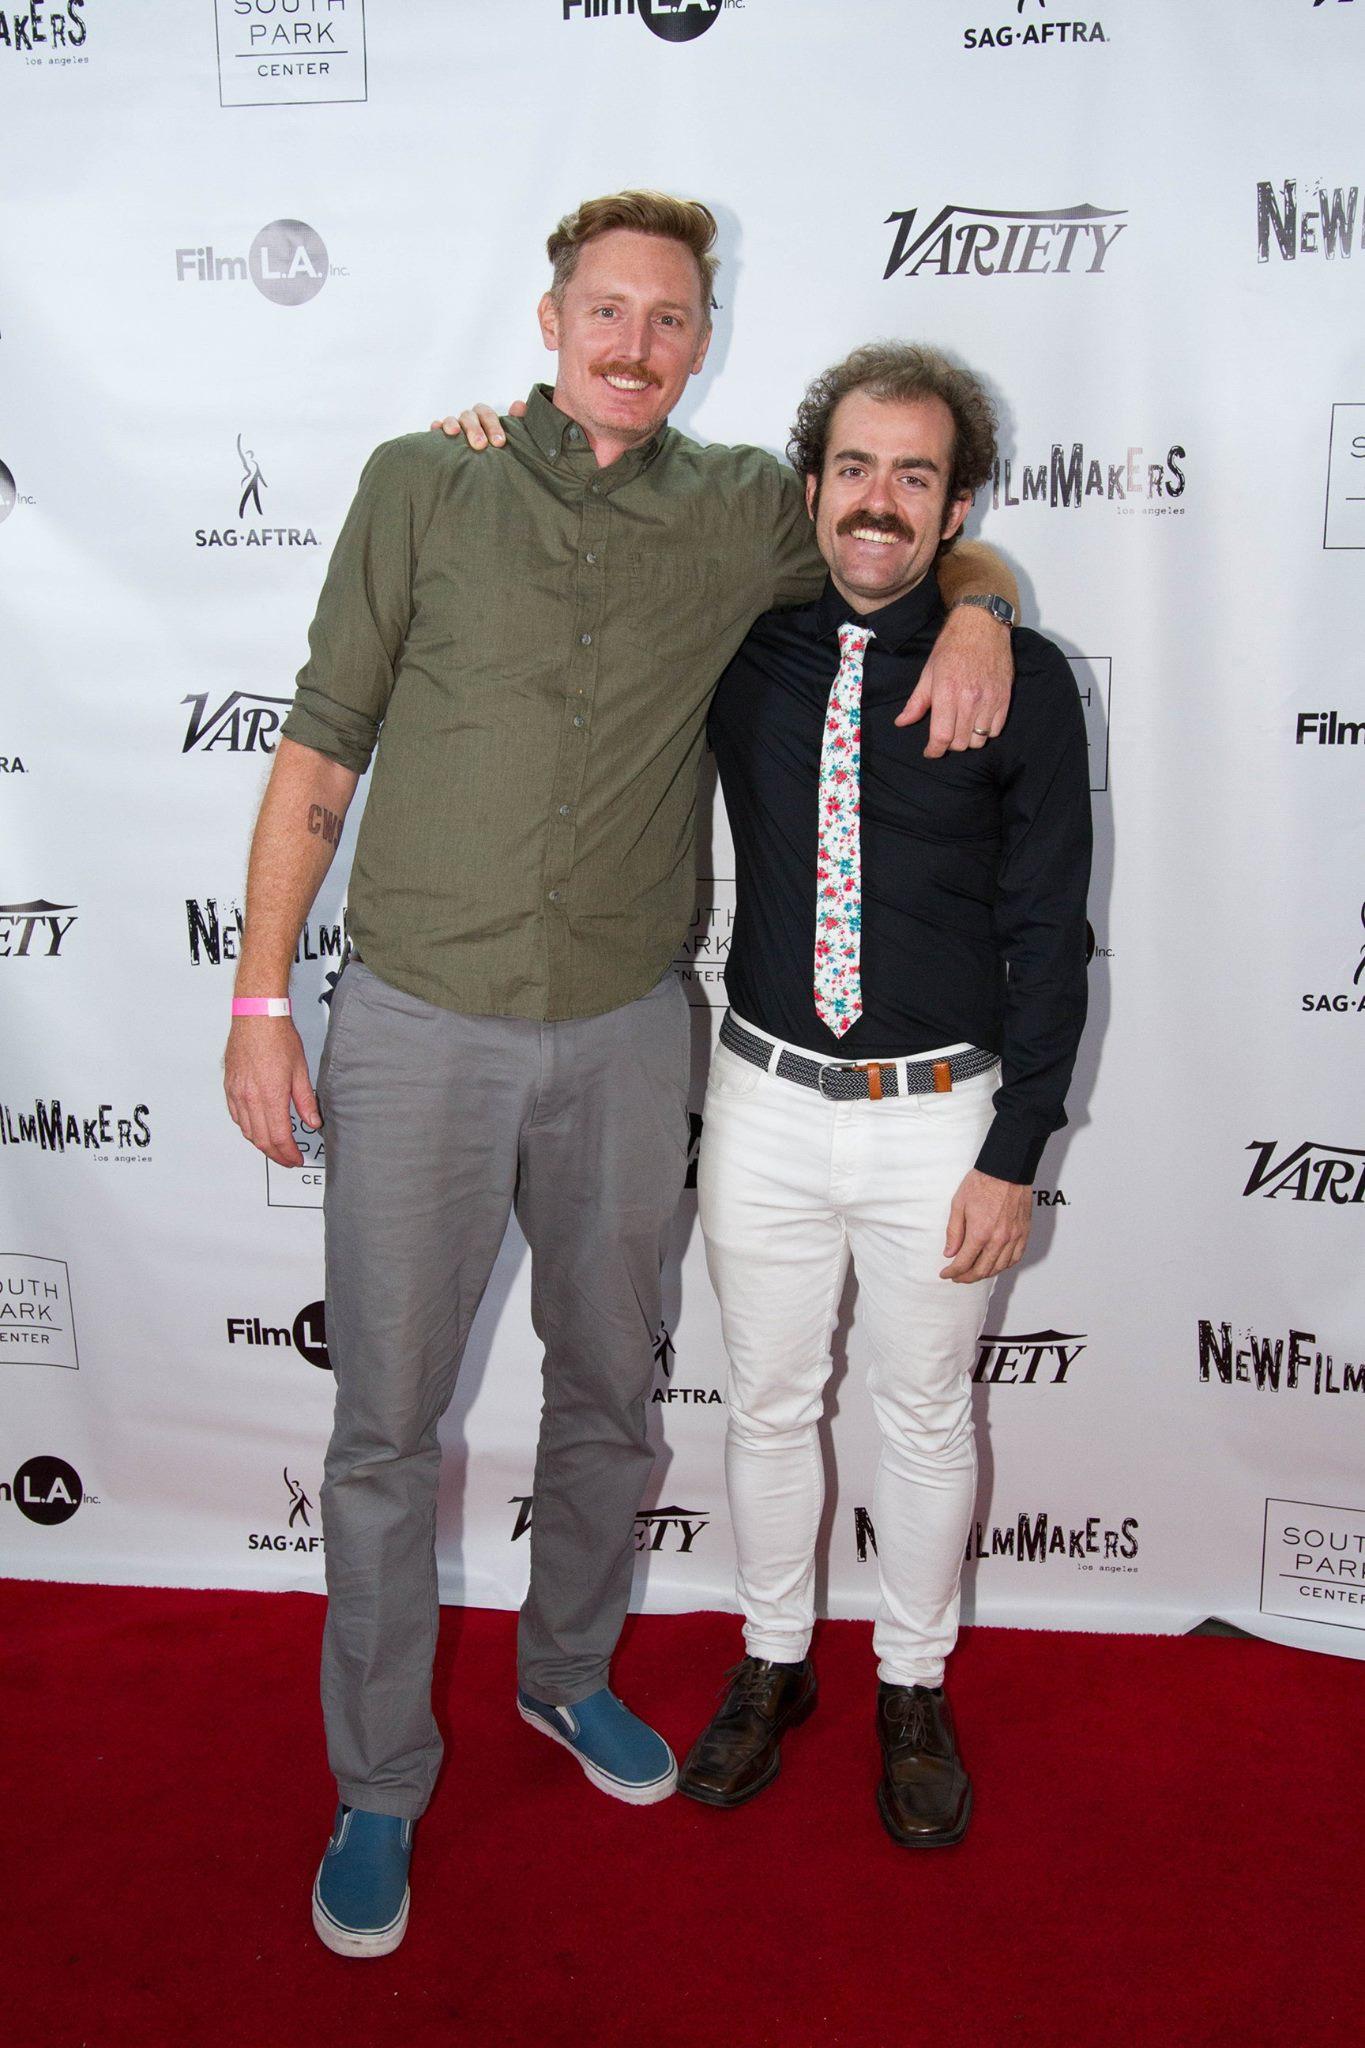 Aaron Gambel & Sean David Christensen take to the red carpet at DocuSlate; December 2nd, 2017 at South Park Center.